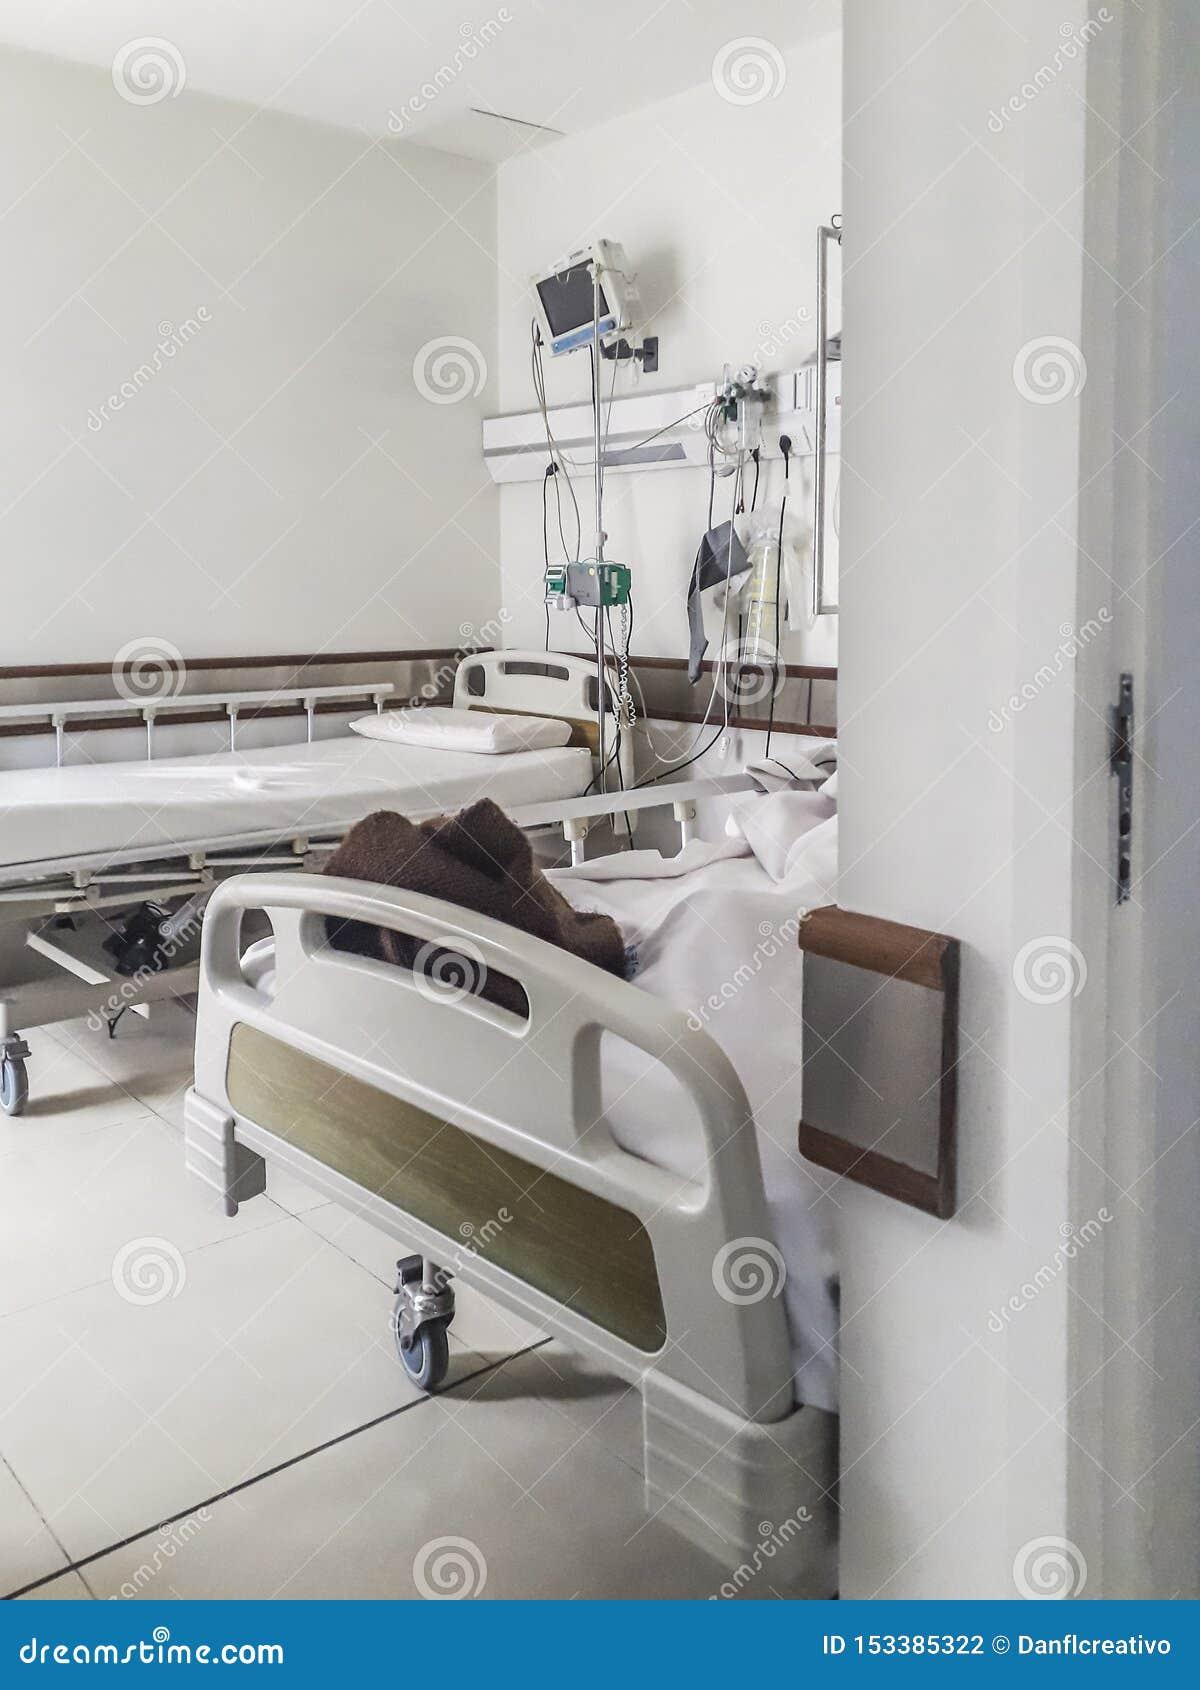 Hospital Emergency Room: Empty Hospital Emergency Room Stock Photo